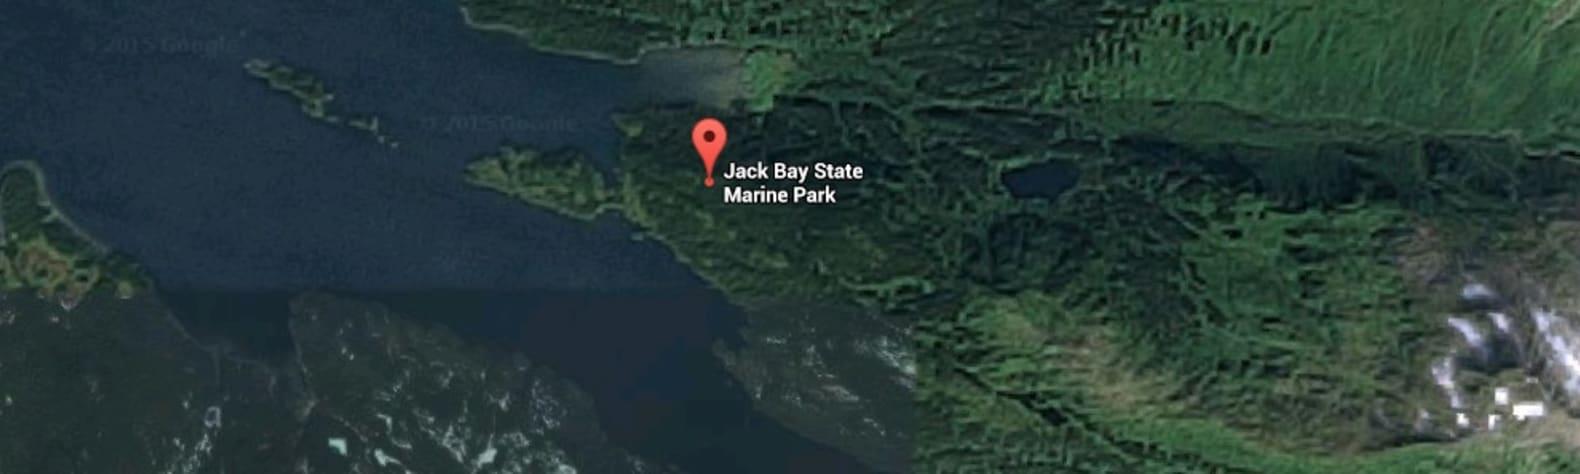 Jack Bay State Marine Park